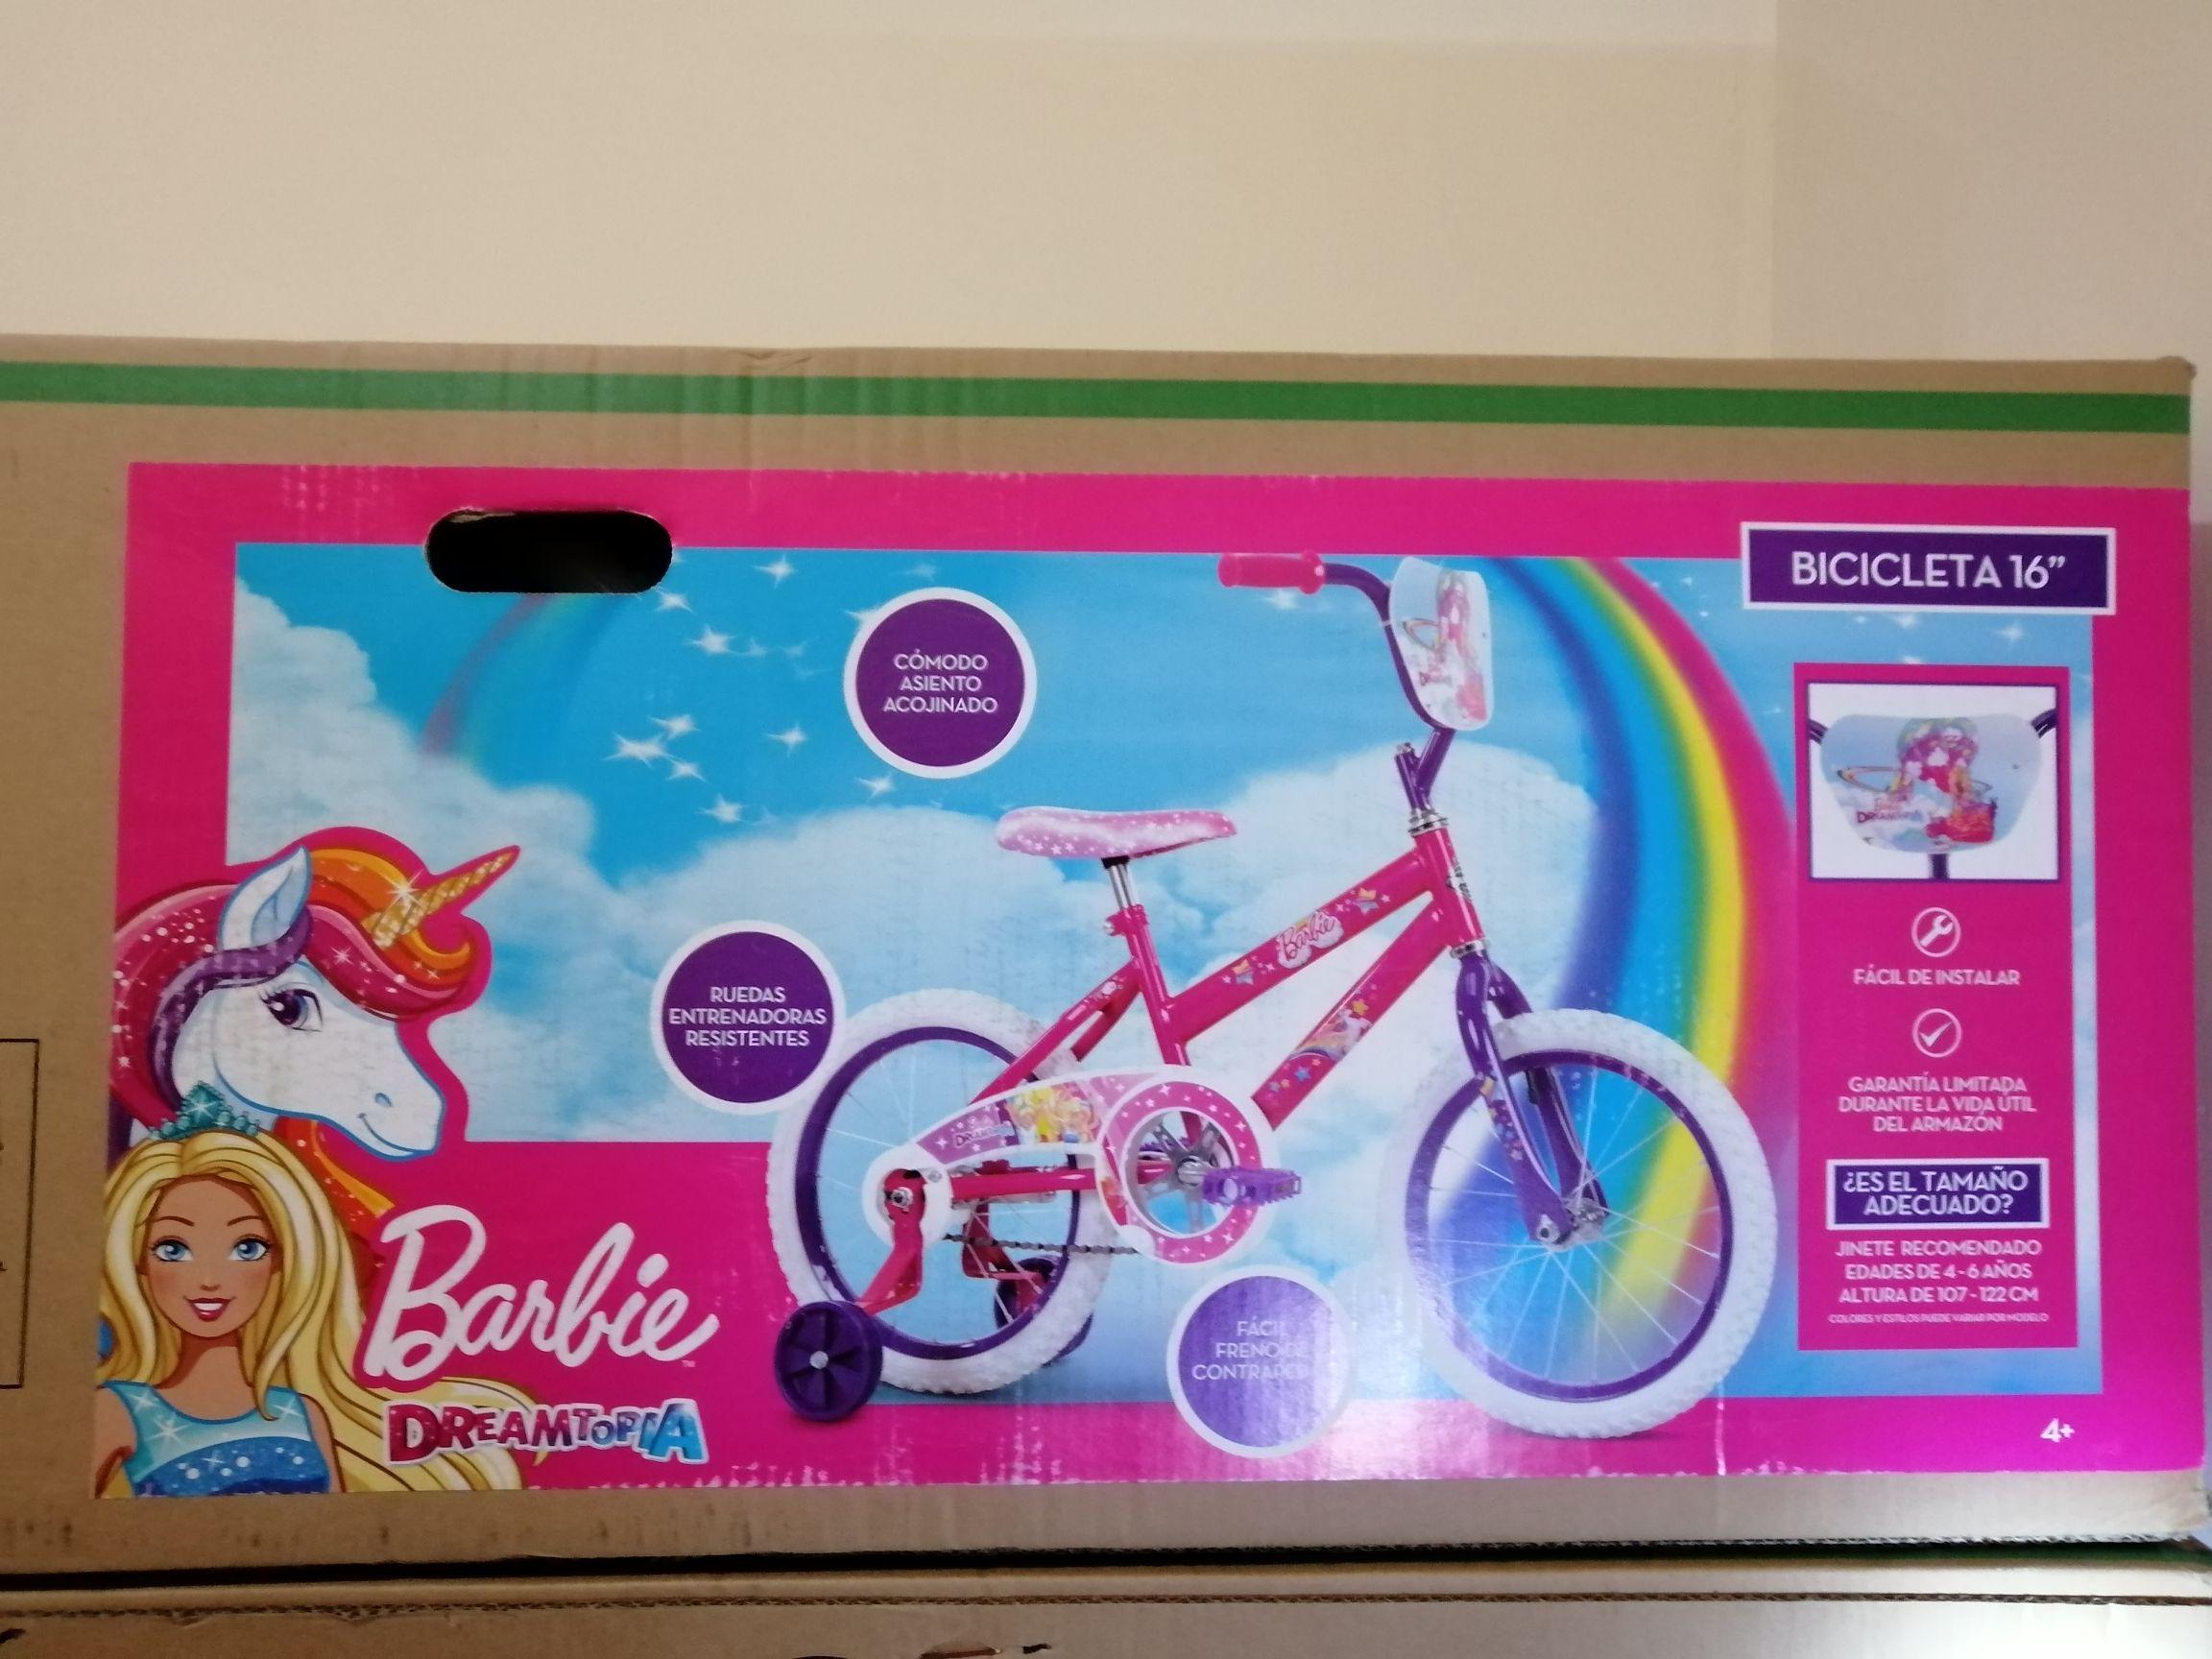 Bodega Aurrerá: Bicicleta barbie rodada 16 y Set de basket para niños